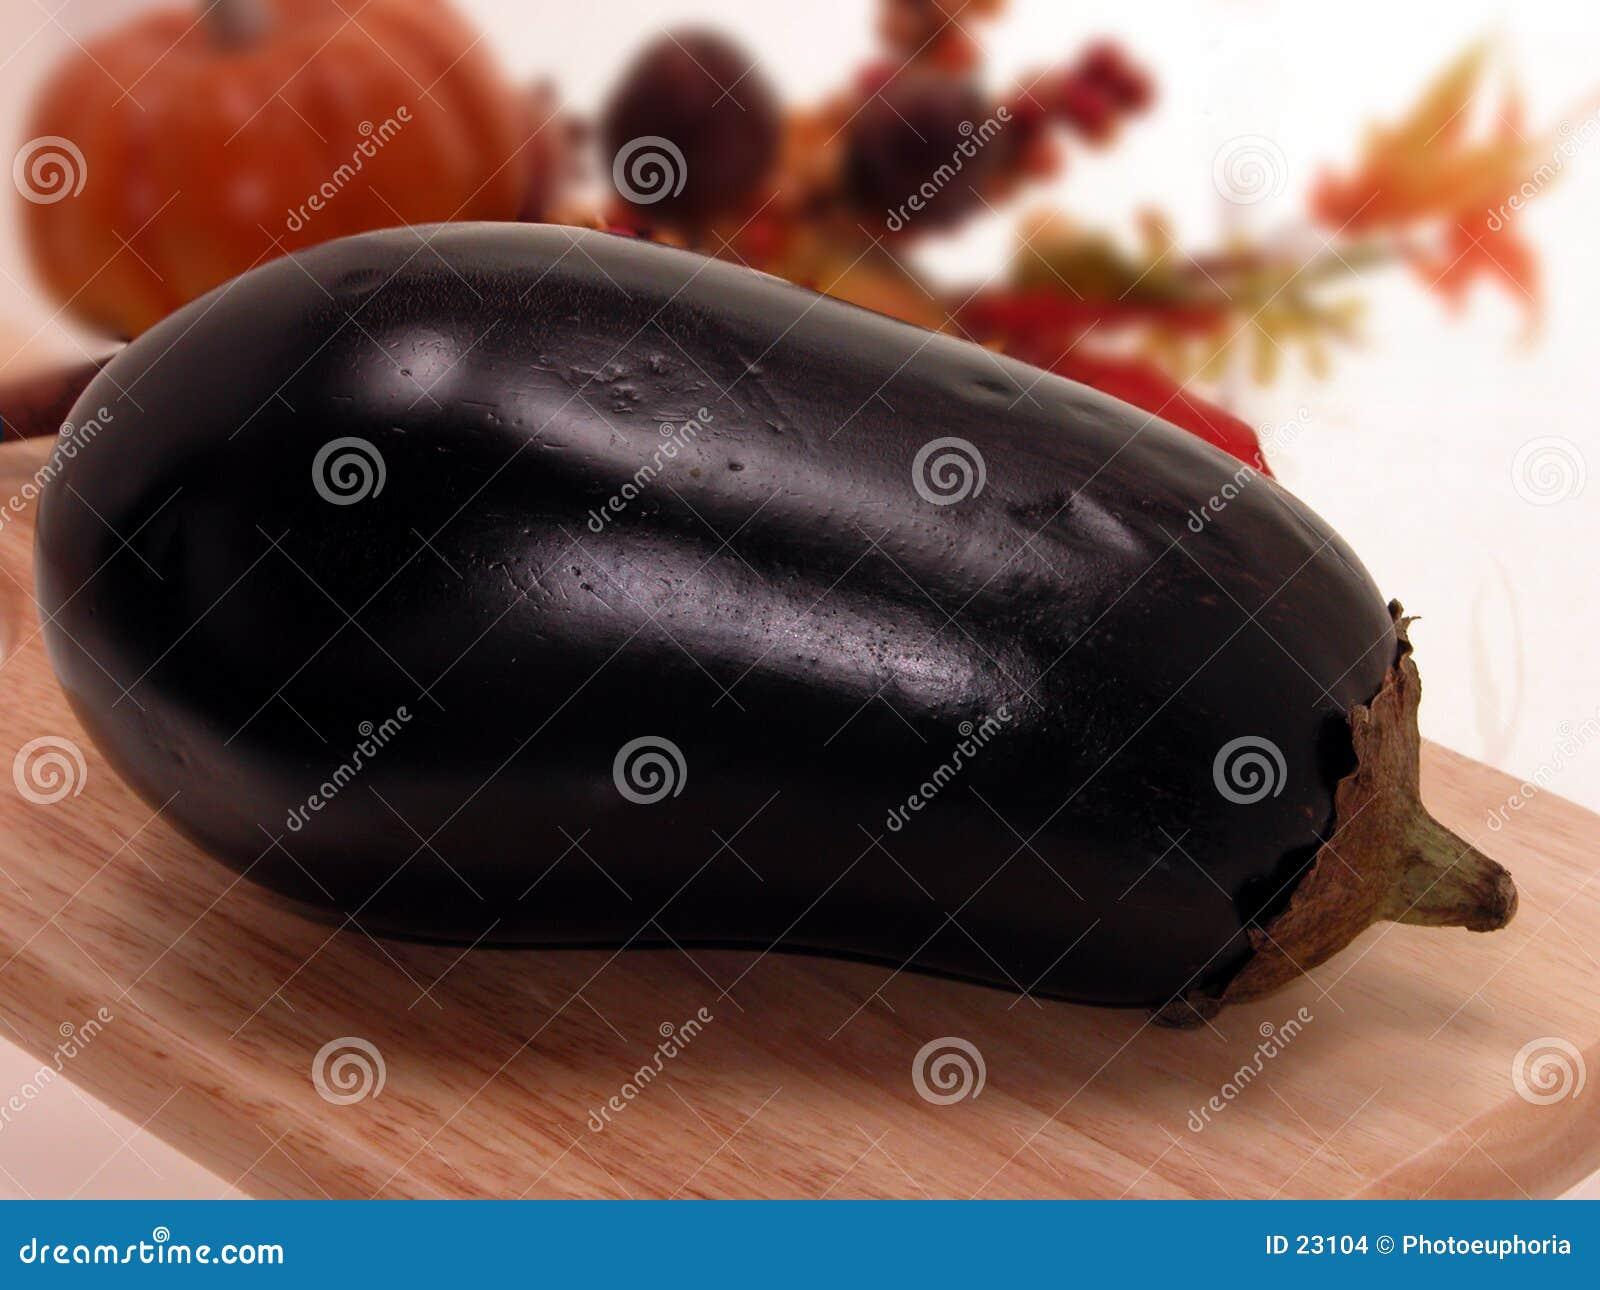 Eggplant Still Life